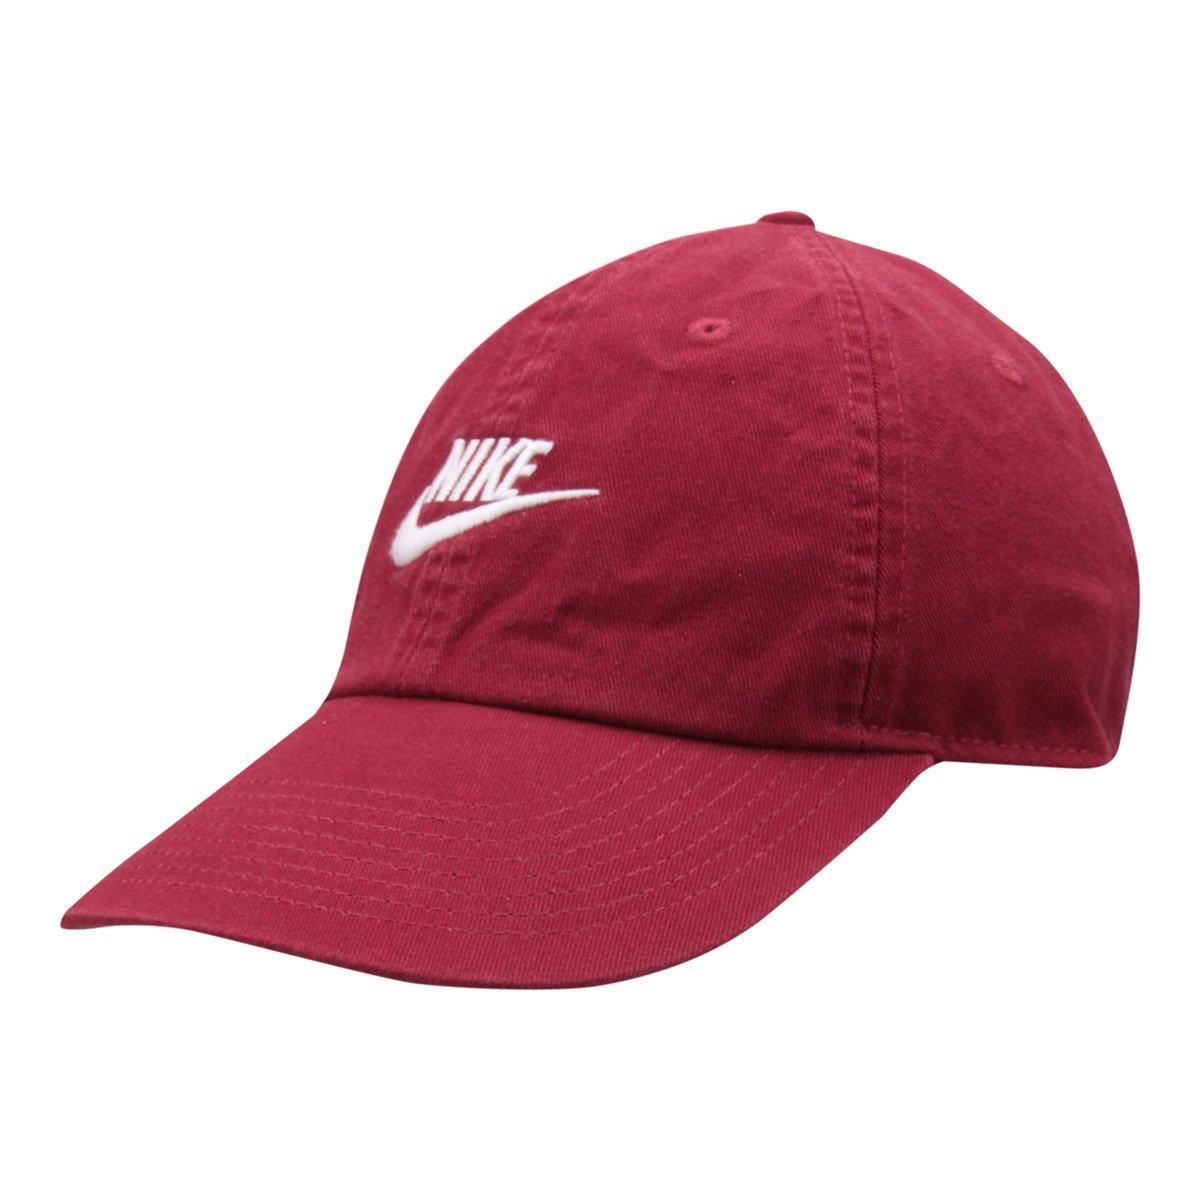 e4434f2d04 Boné Nike Aba Curva U Nsw H86 Futura Washed - Vermelho